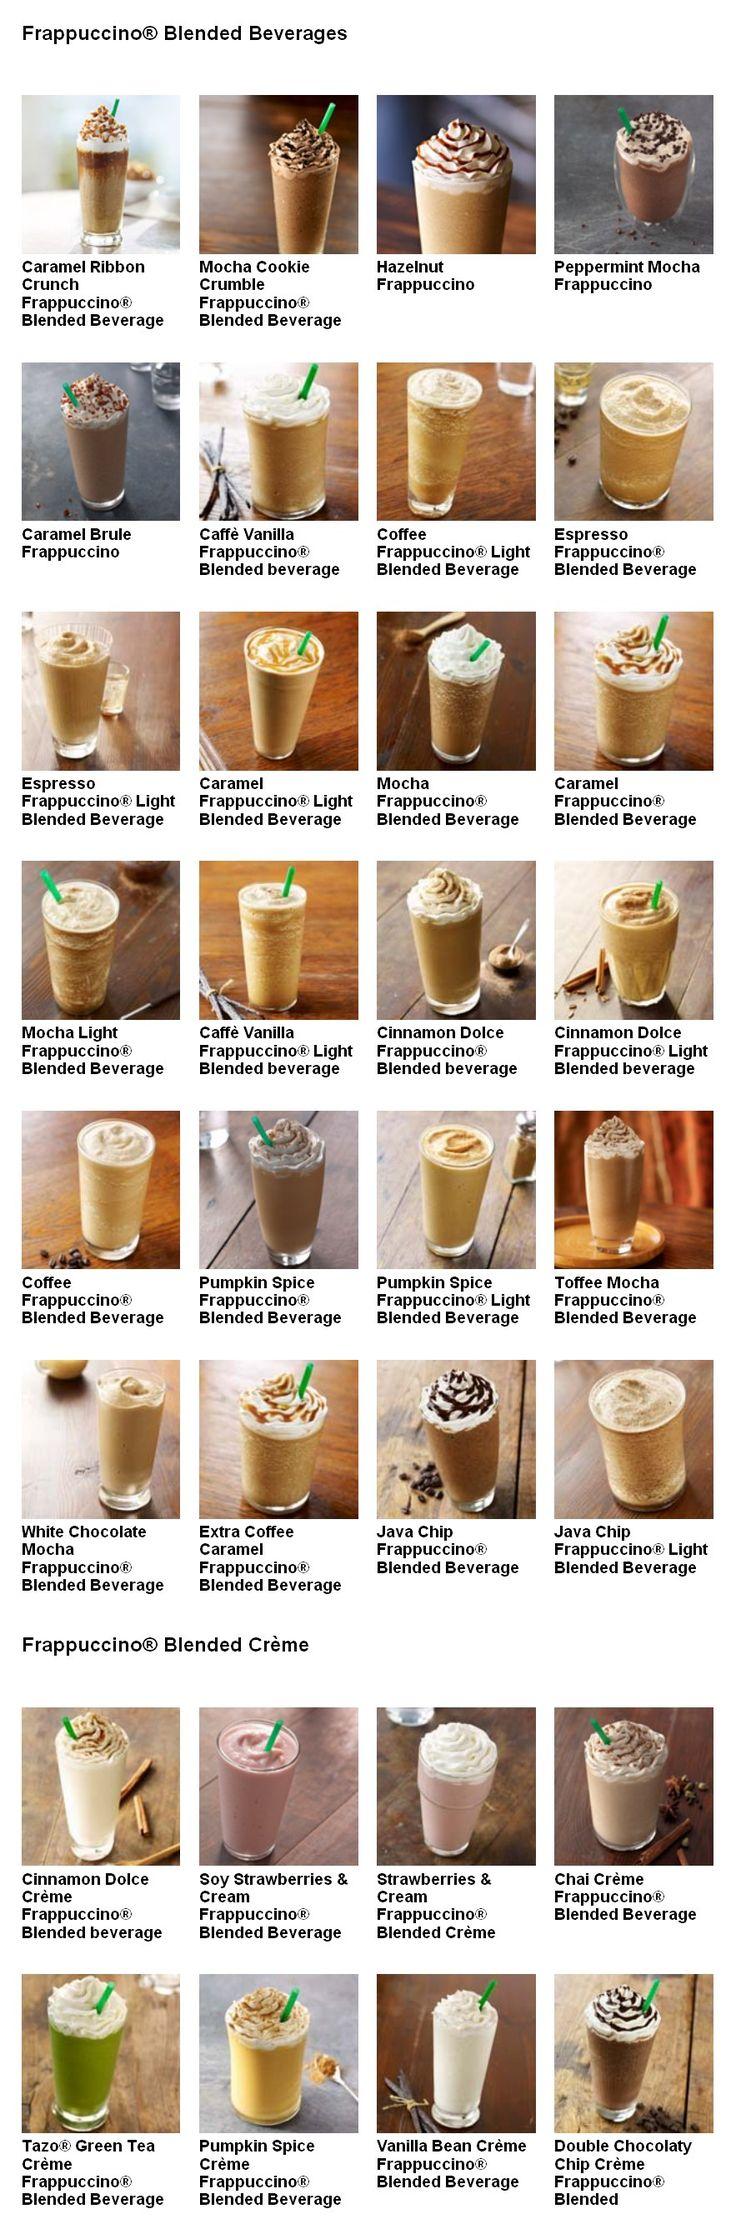 Starbucks Frappuccino Menu -Yummmm!!!!!